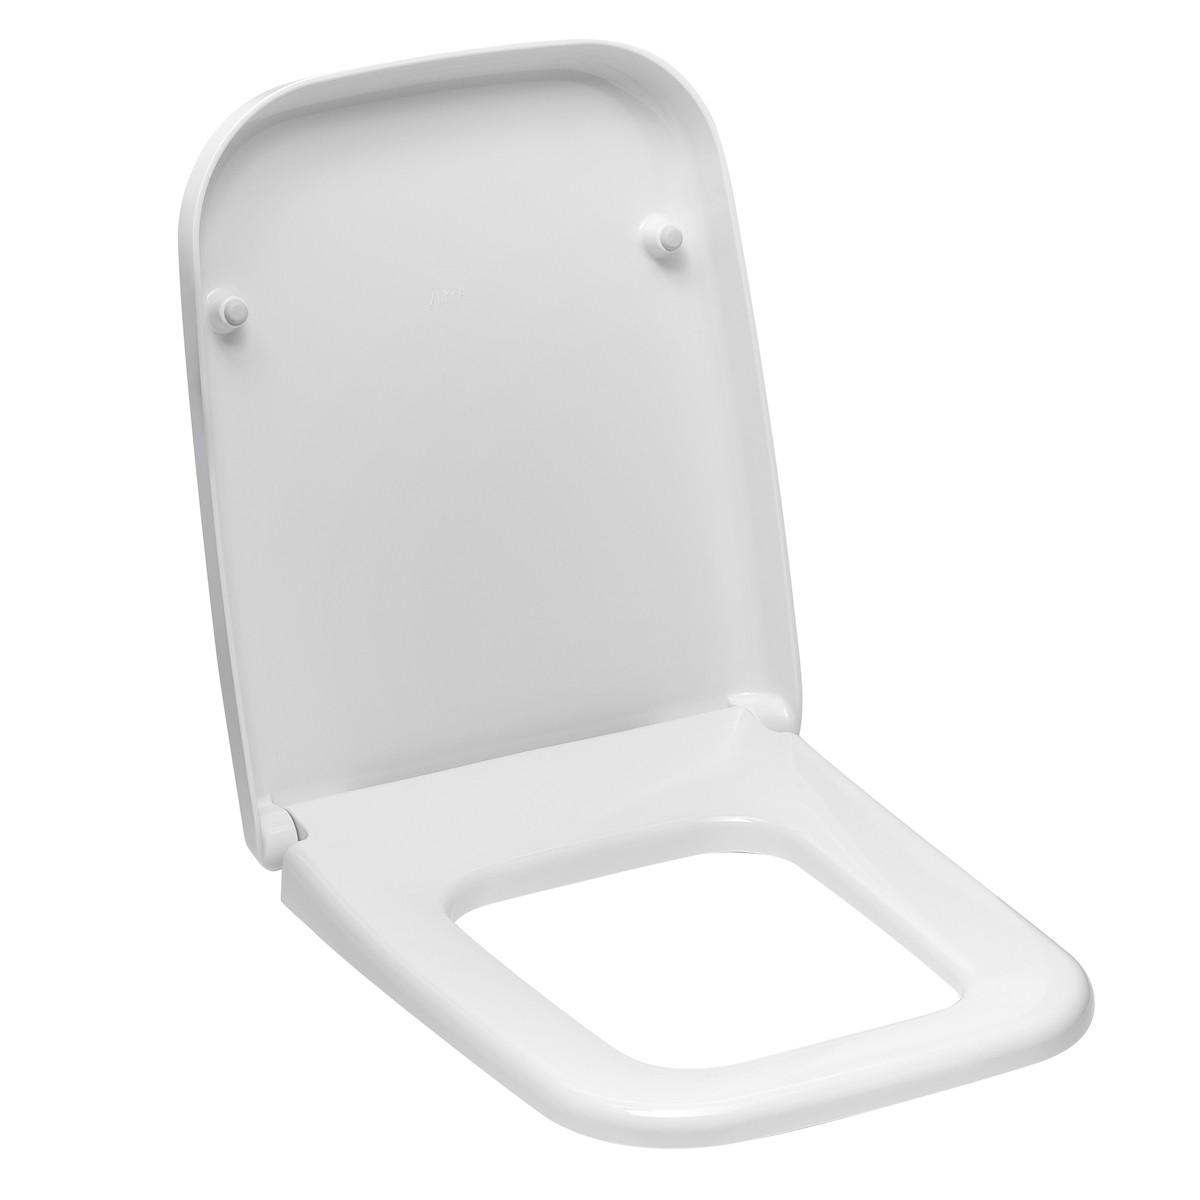 WC doska Vitra Shift duroplast biela 91-003-409